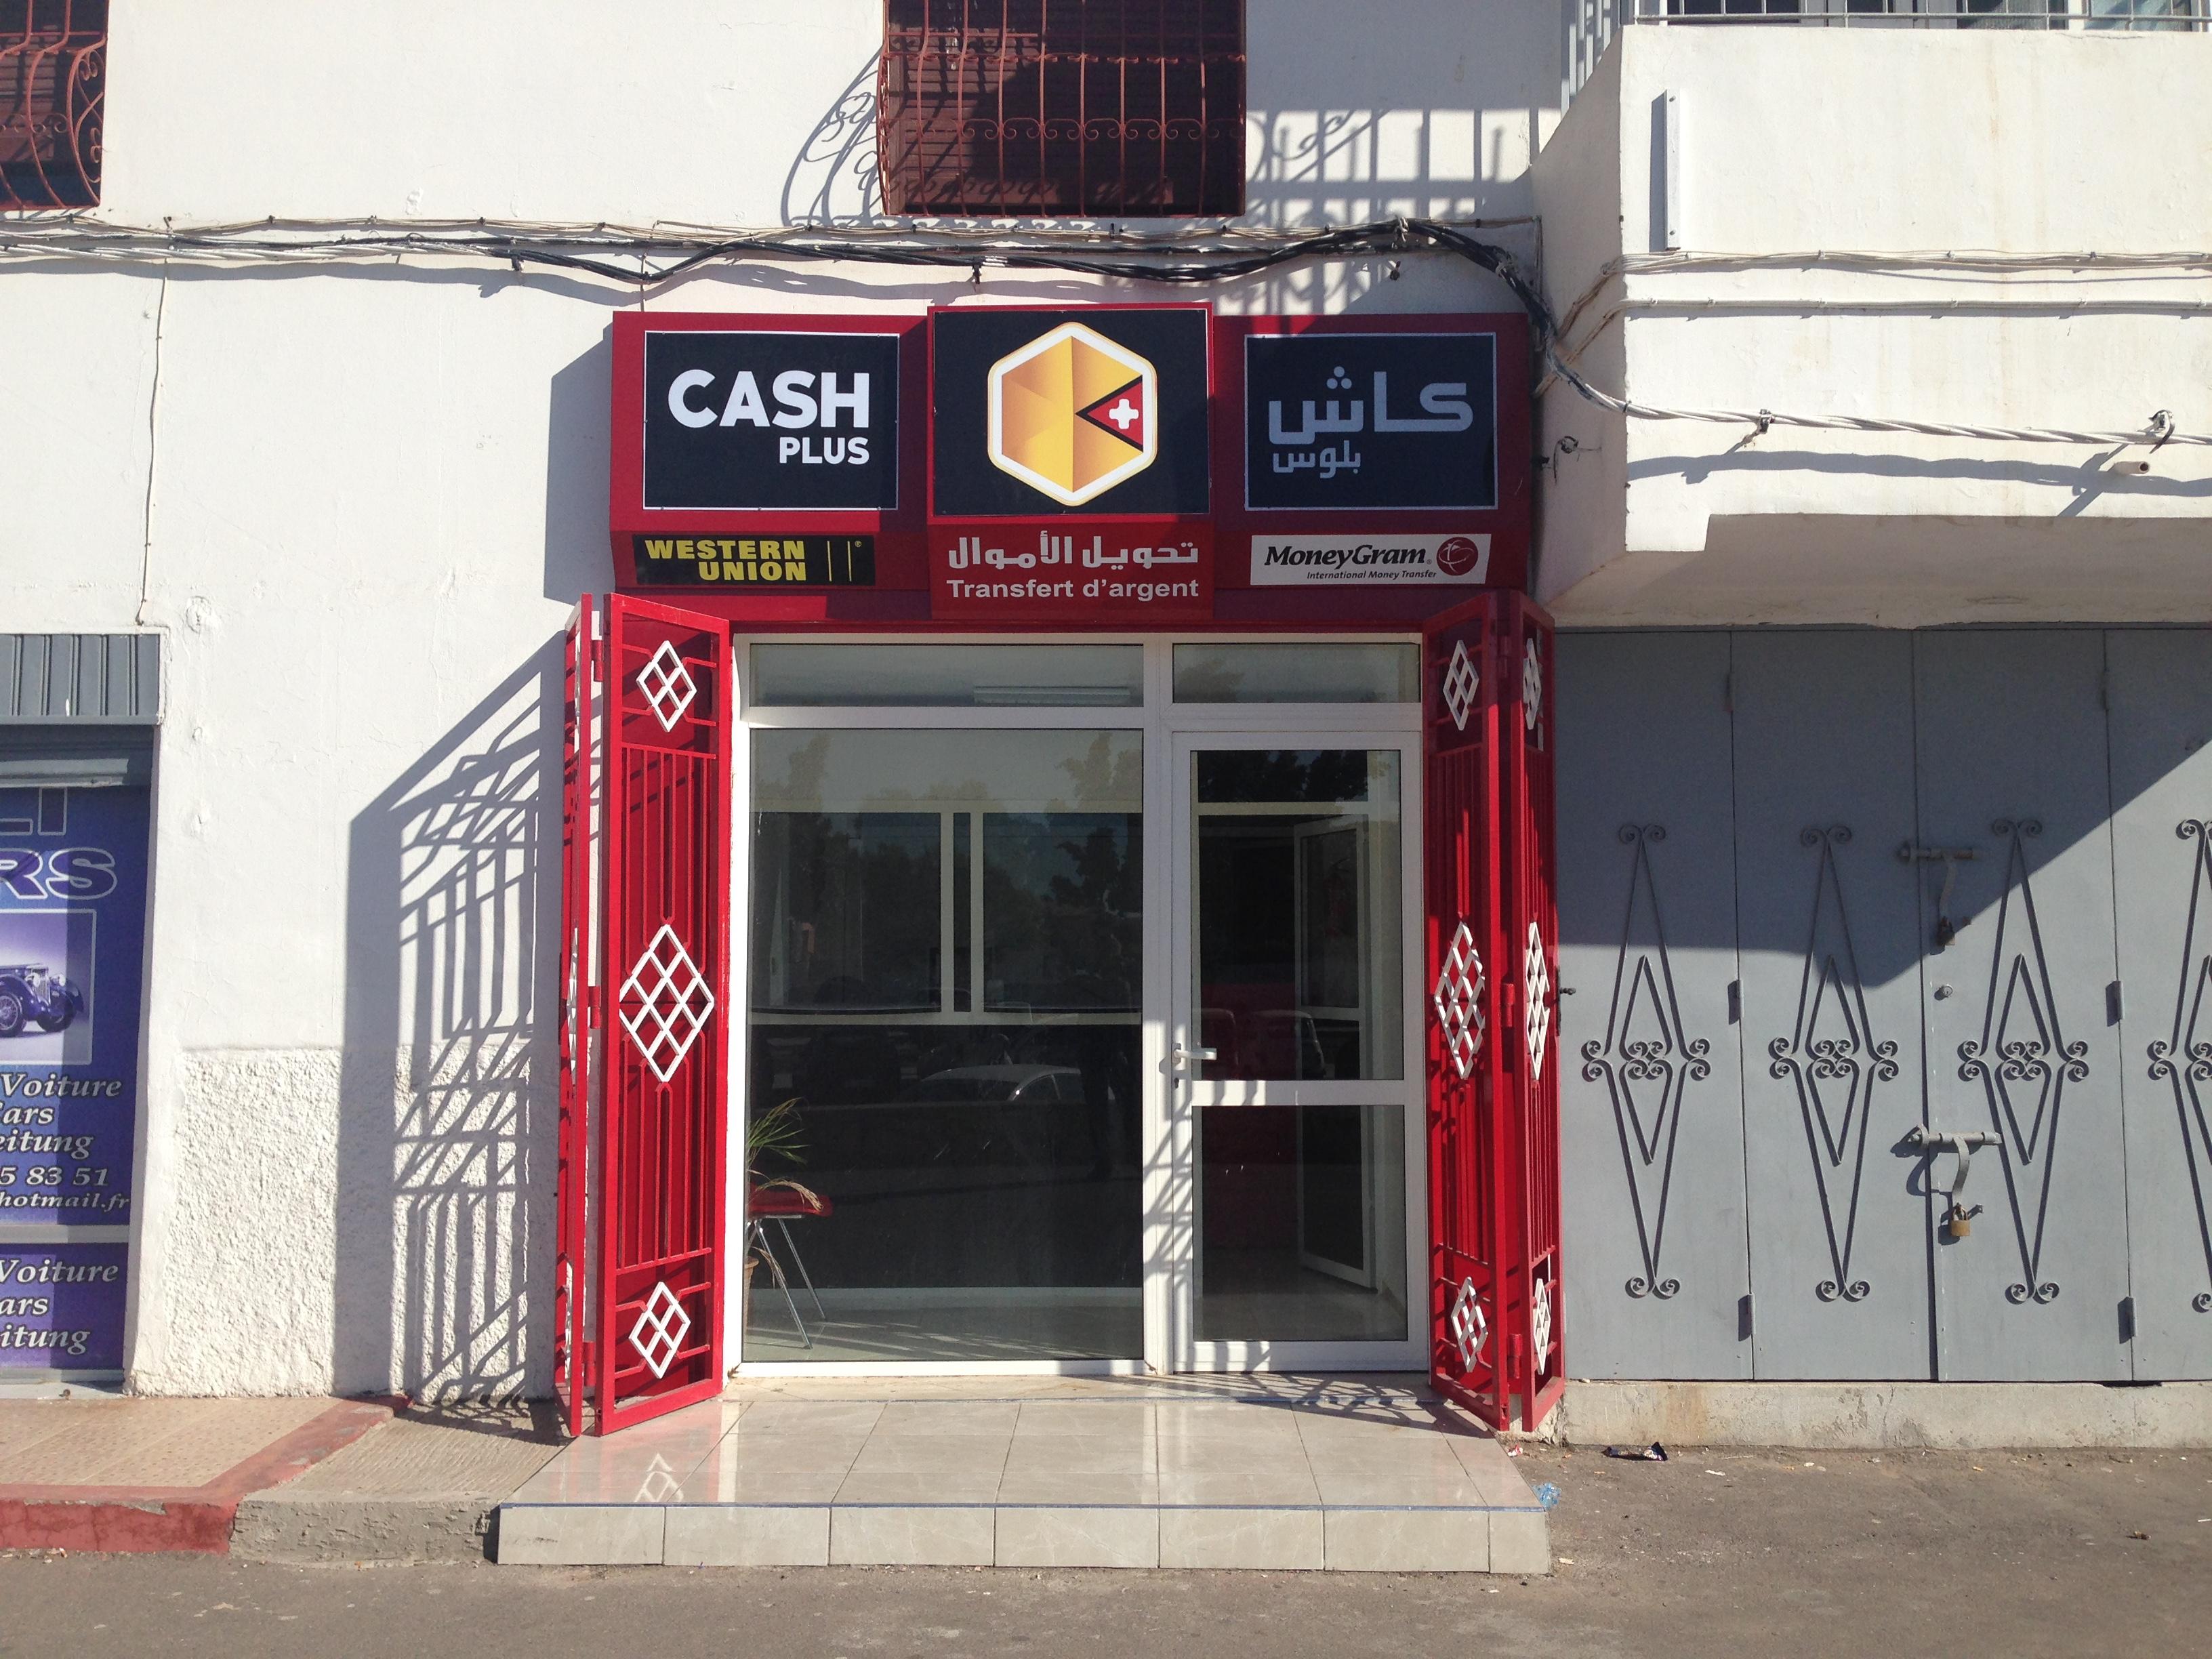 Cash plus agadir agence ihchach agadir ⴰⴳⴰⴷⵉⵔ